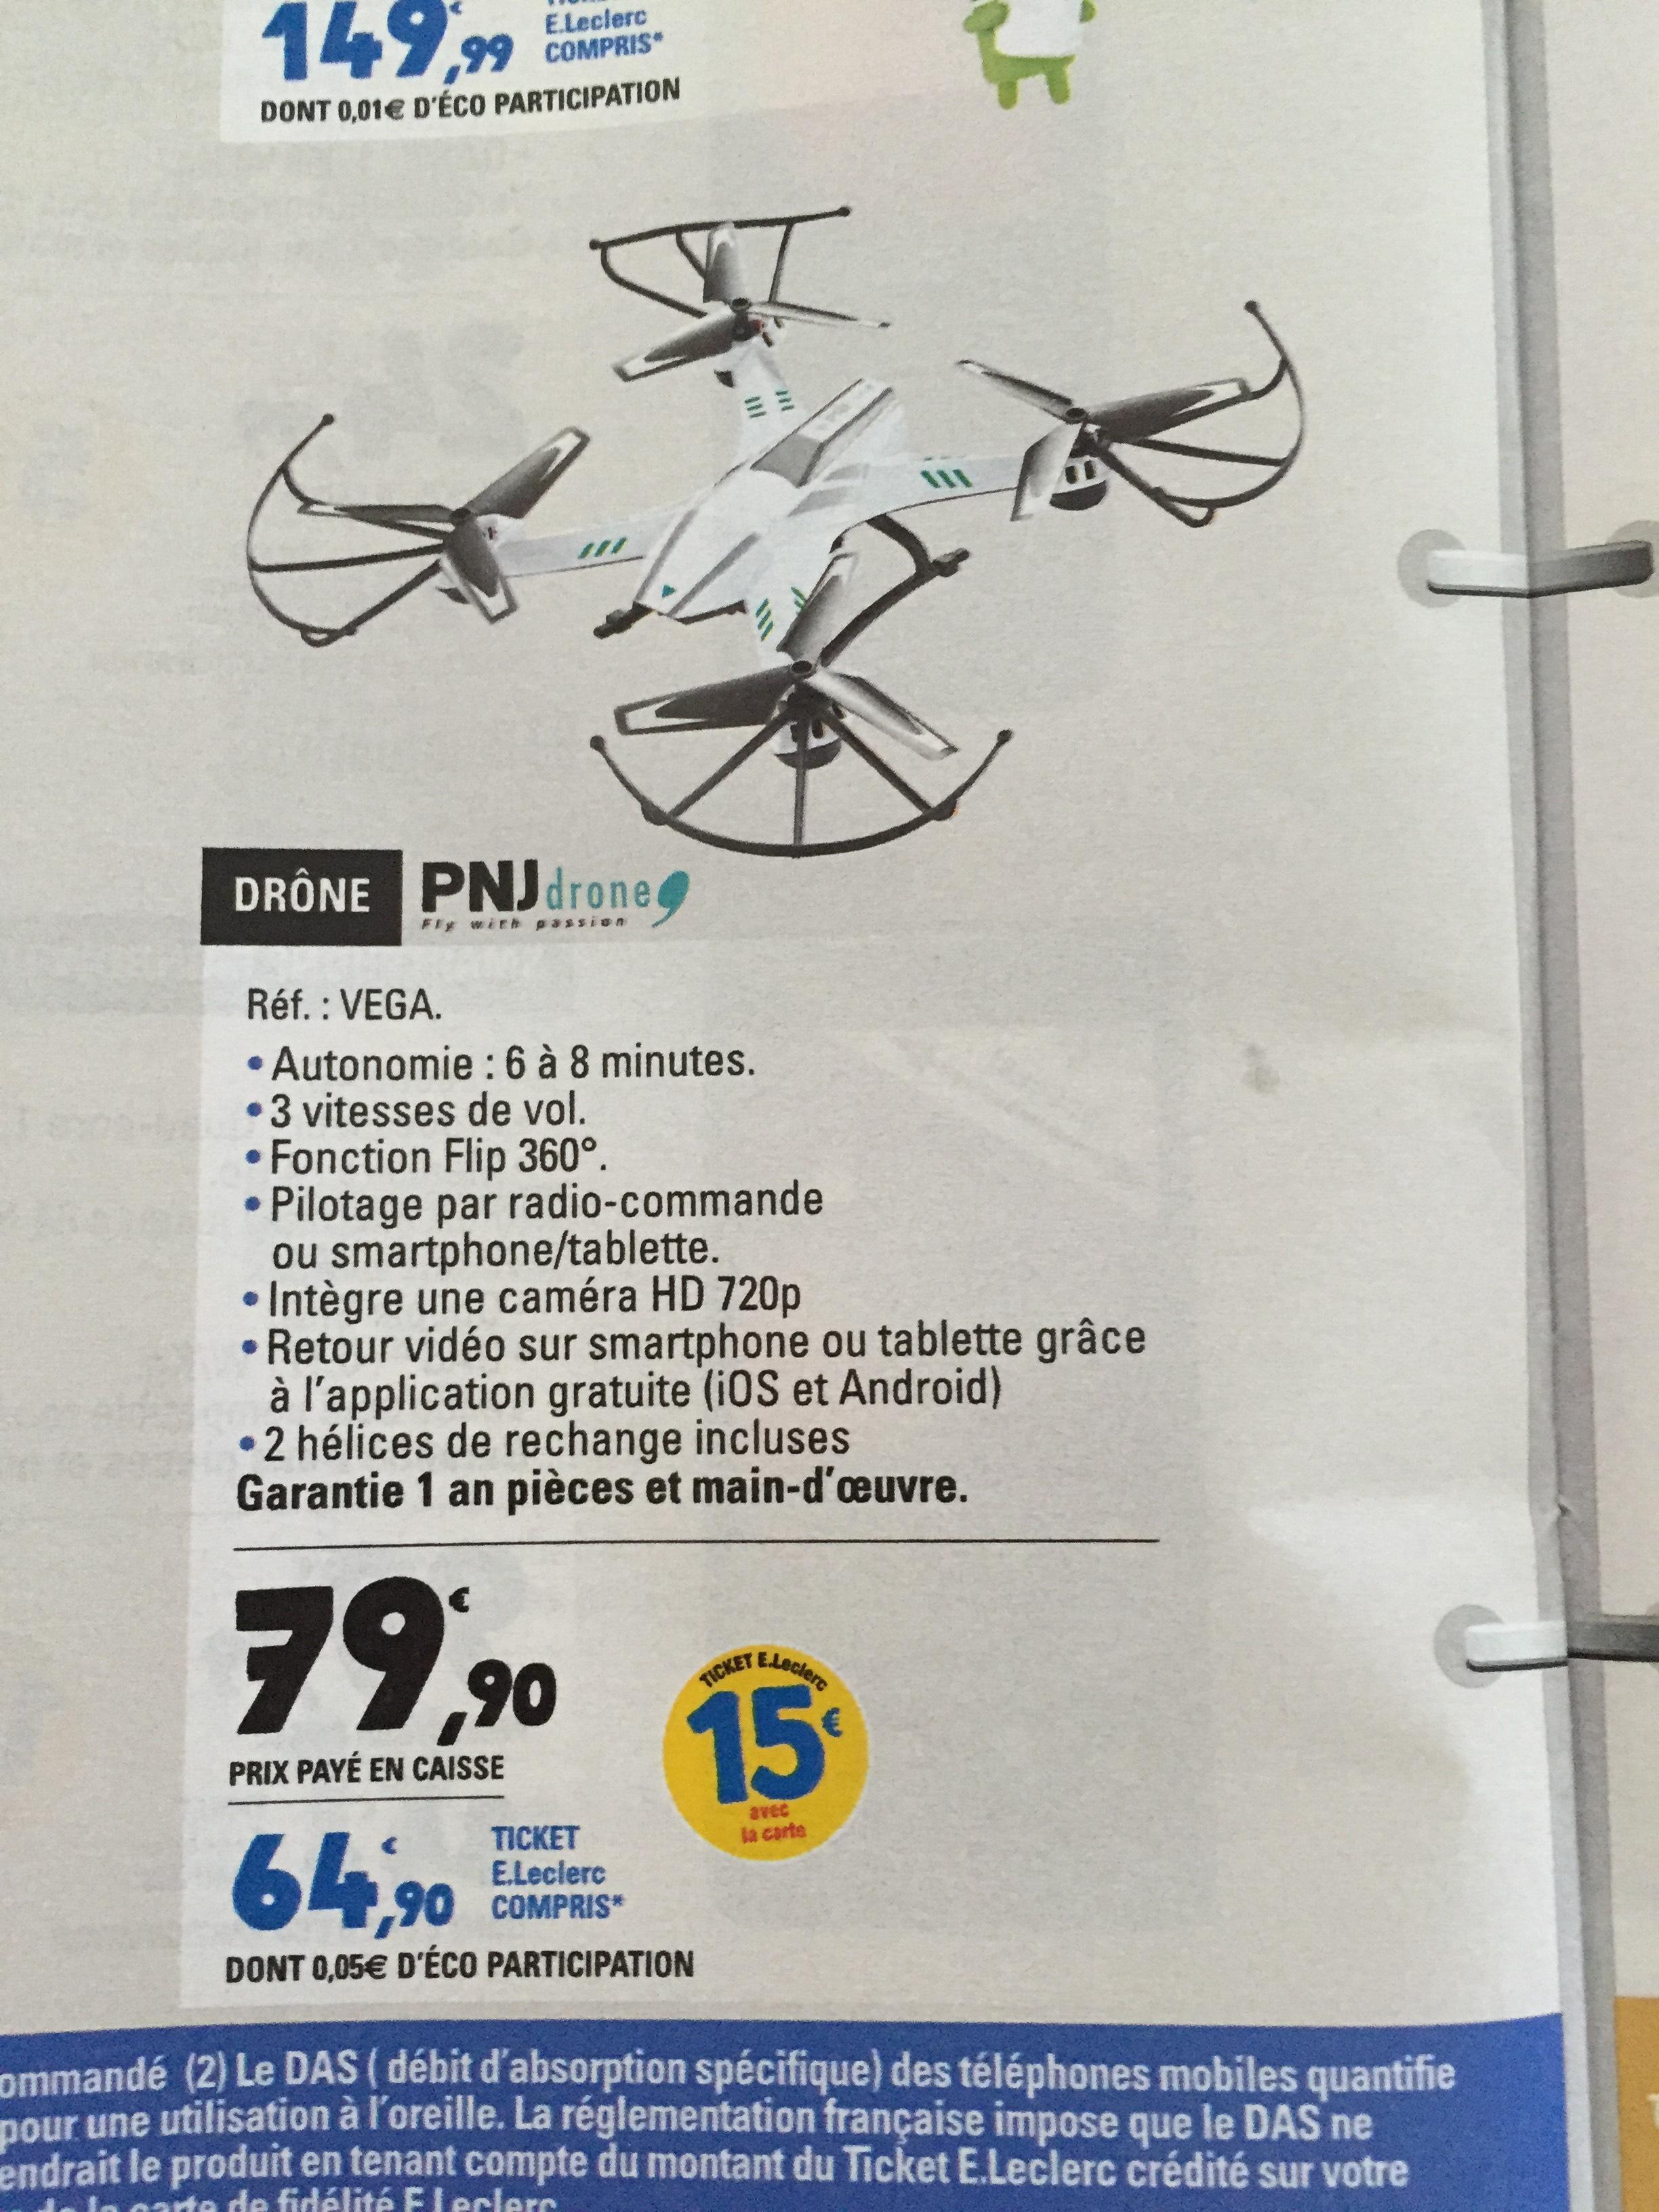 Drône PNJdrone Vega - Camera 720p (via 15€ ticket leclerc)